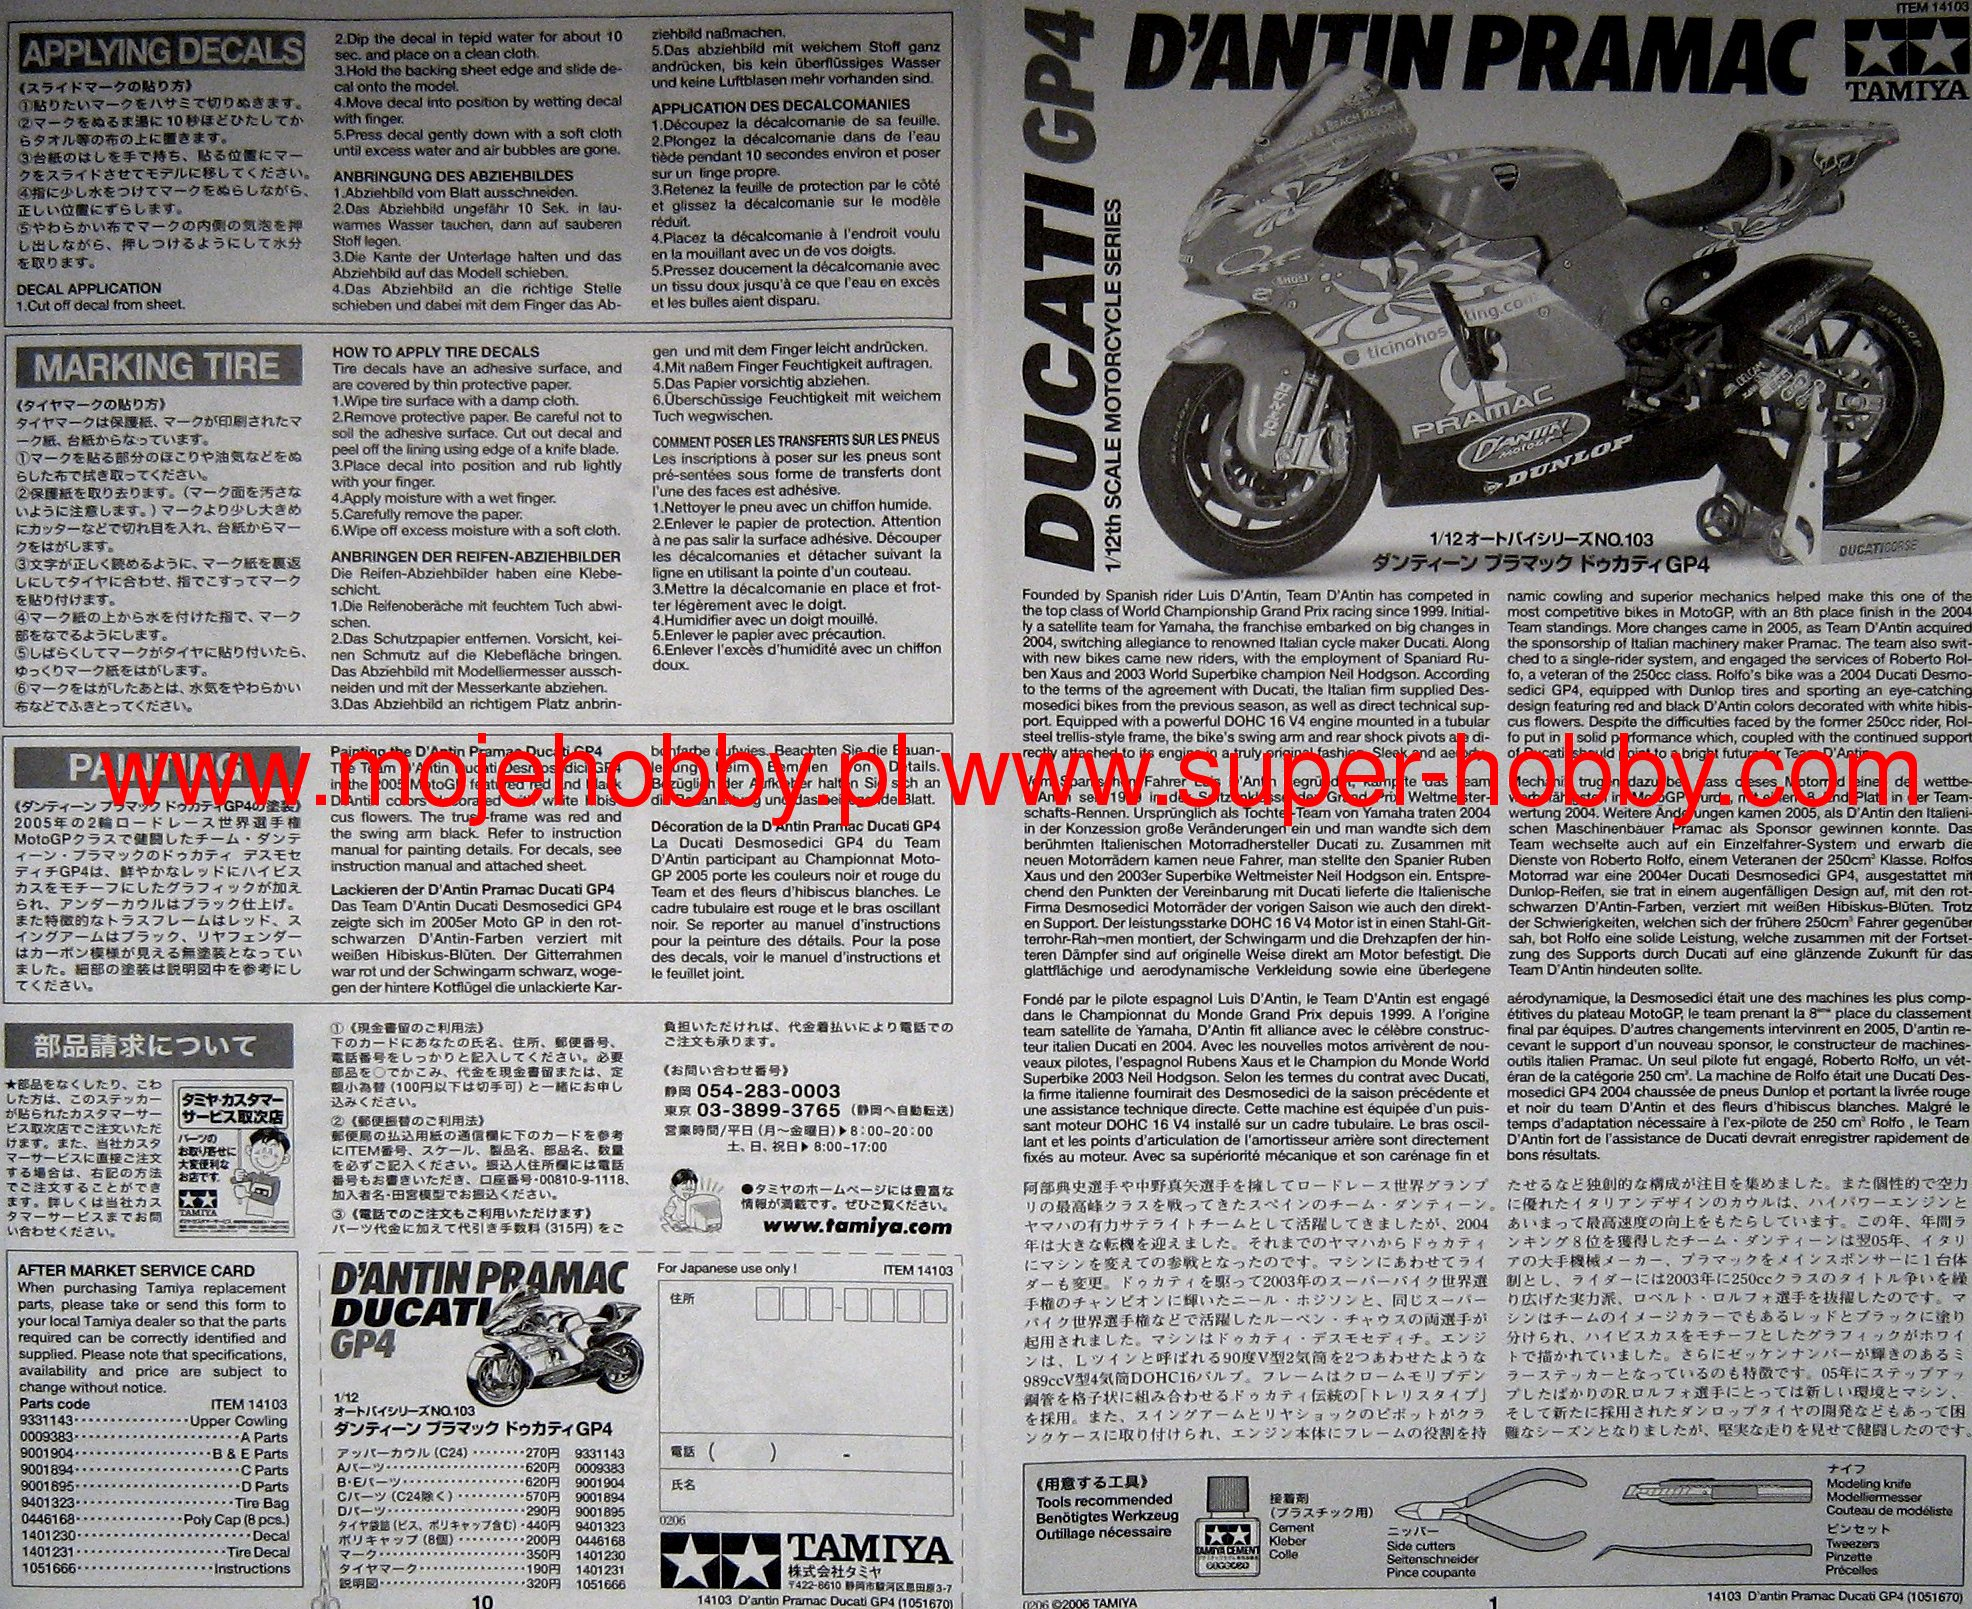 Team Dantin Pramac Ducati Tamiya 14103 Scale Kits Desmosedici 2 Tam14103 1